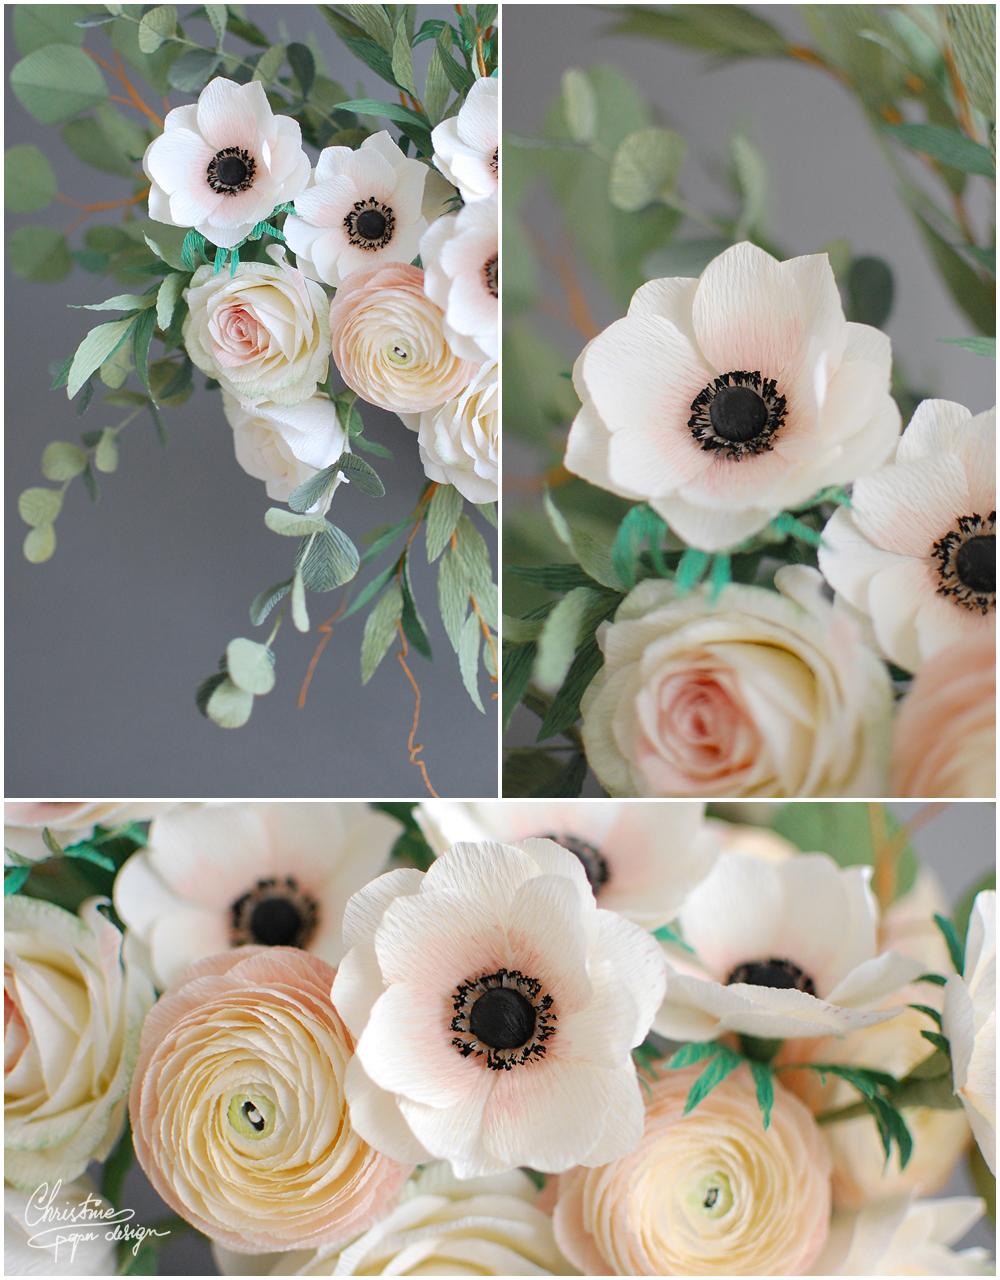 Christine paper design -anemone